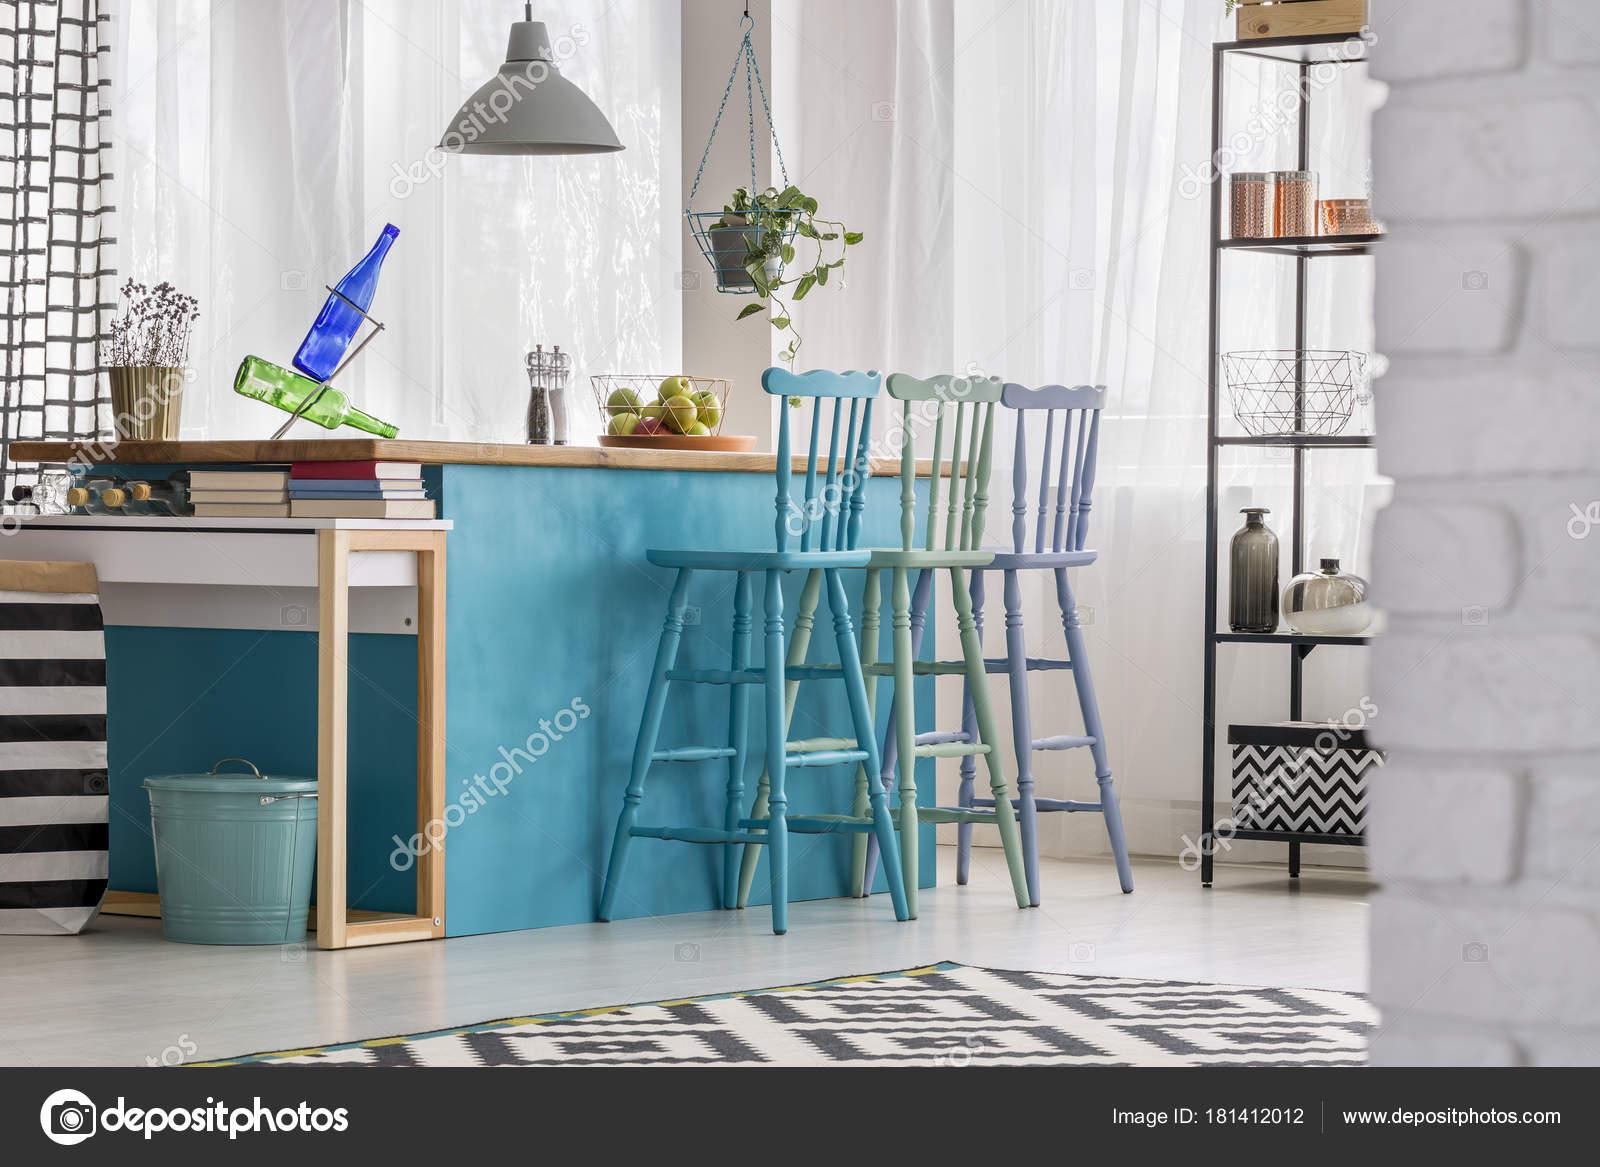 Pastell barhocker in bunte küche u2014 stockfoto © photographee.eu